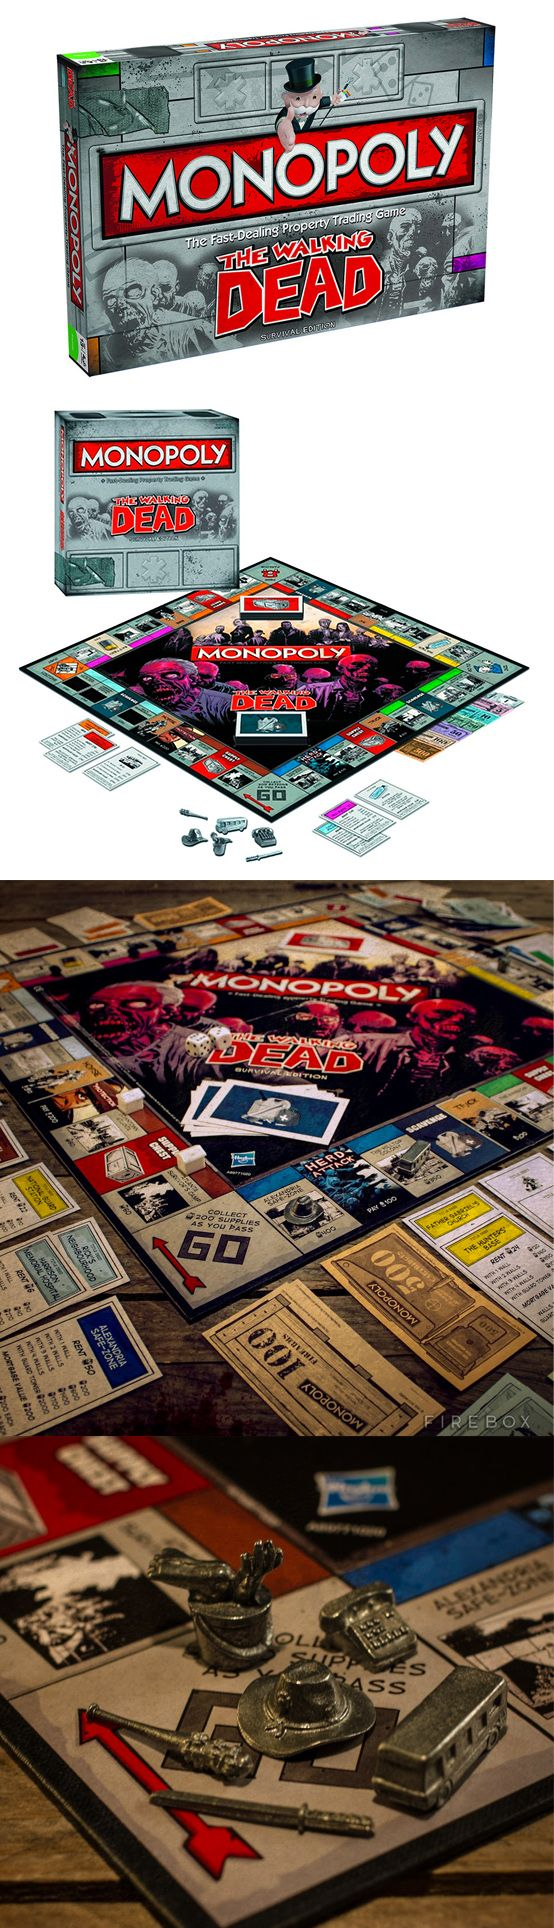 Un #monopoly para los amantes de The Walking Dead como nosotros! - The Walking Dead monopoly  #Regalos #Frikis #TheWalkingDead #Geek #Gifts